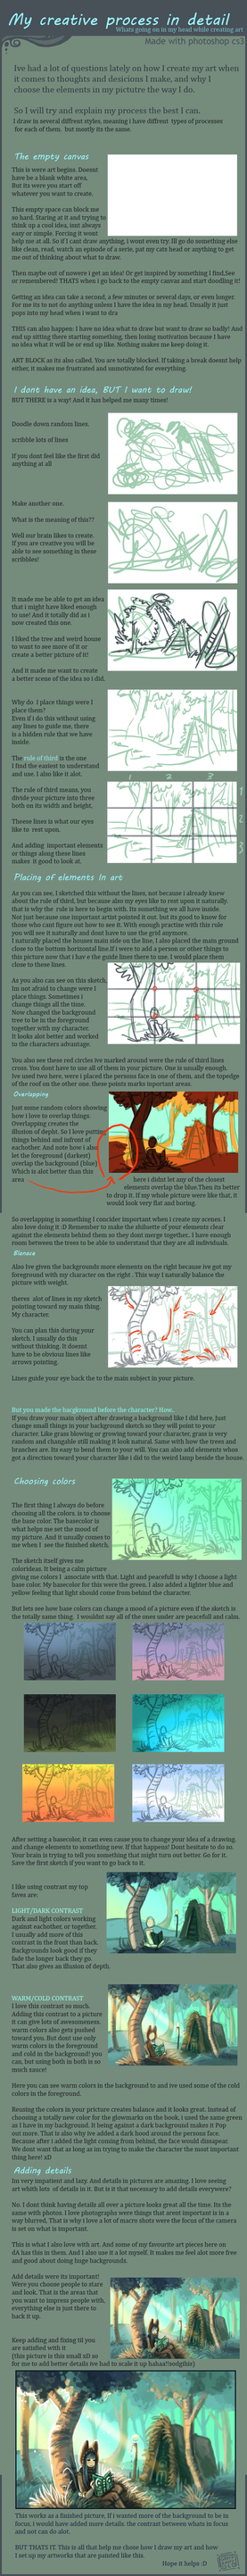 My creative art process by griffsnuff